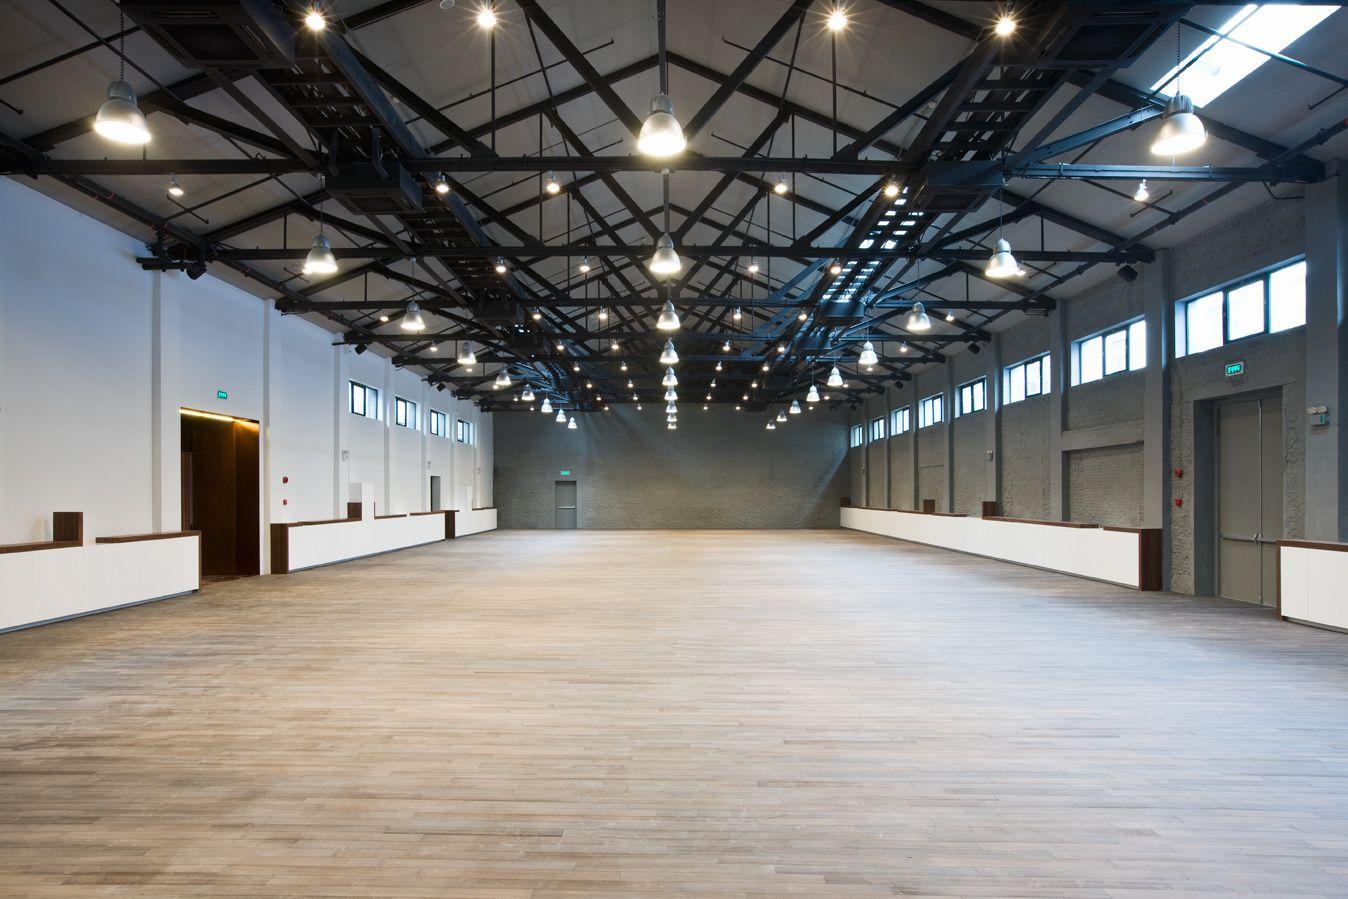 Charmant Warehouse Interior Design   Google Search Interior Design Images, Interior  Design Awards, Button Factory